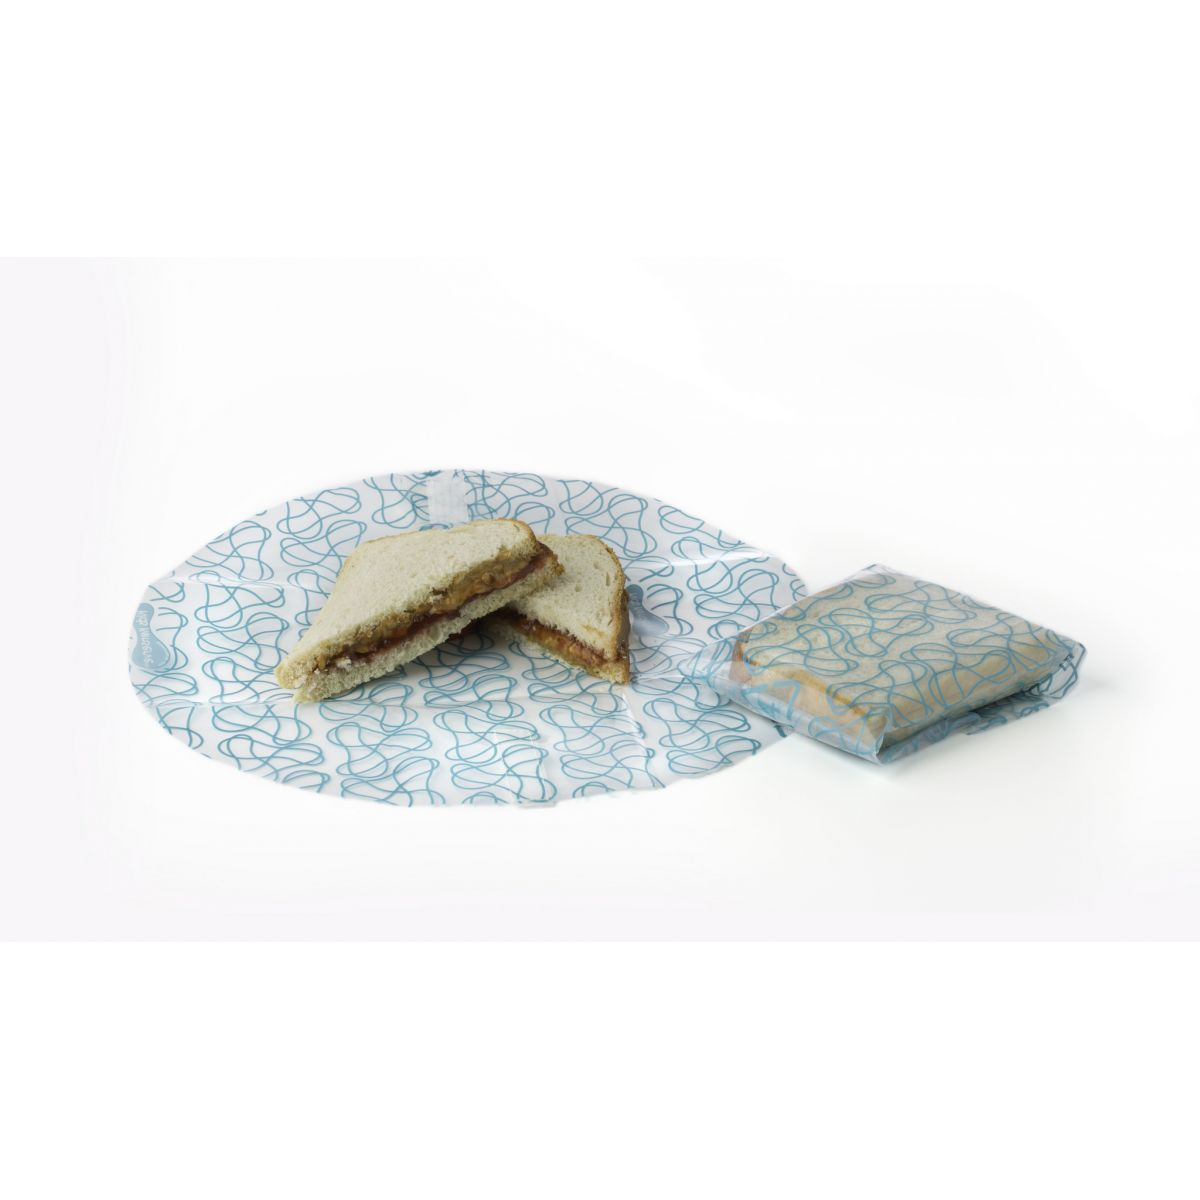 emballages alimentaires r utilisables kozy wrap cristal azur 2 pi ces sebio. Black Bedroom Furniture Sets. Home Design Ideas